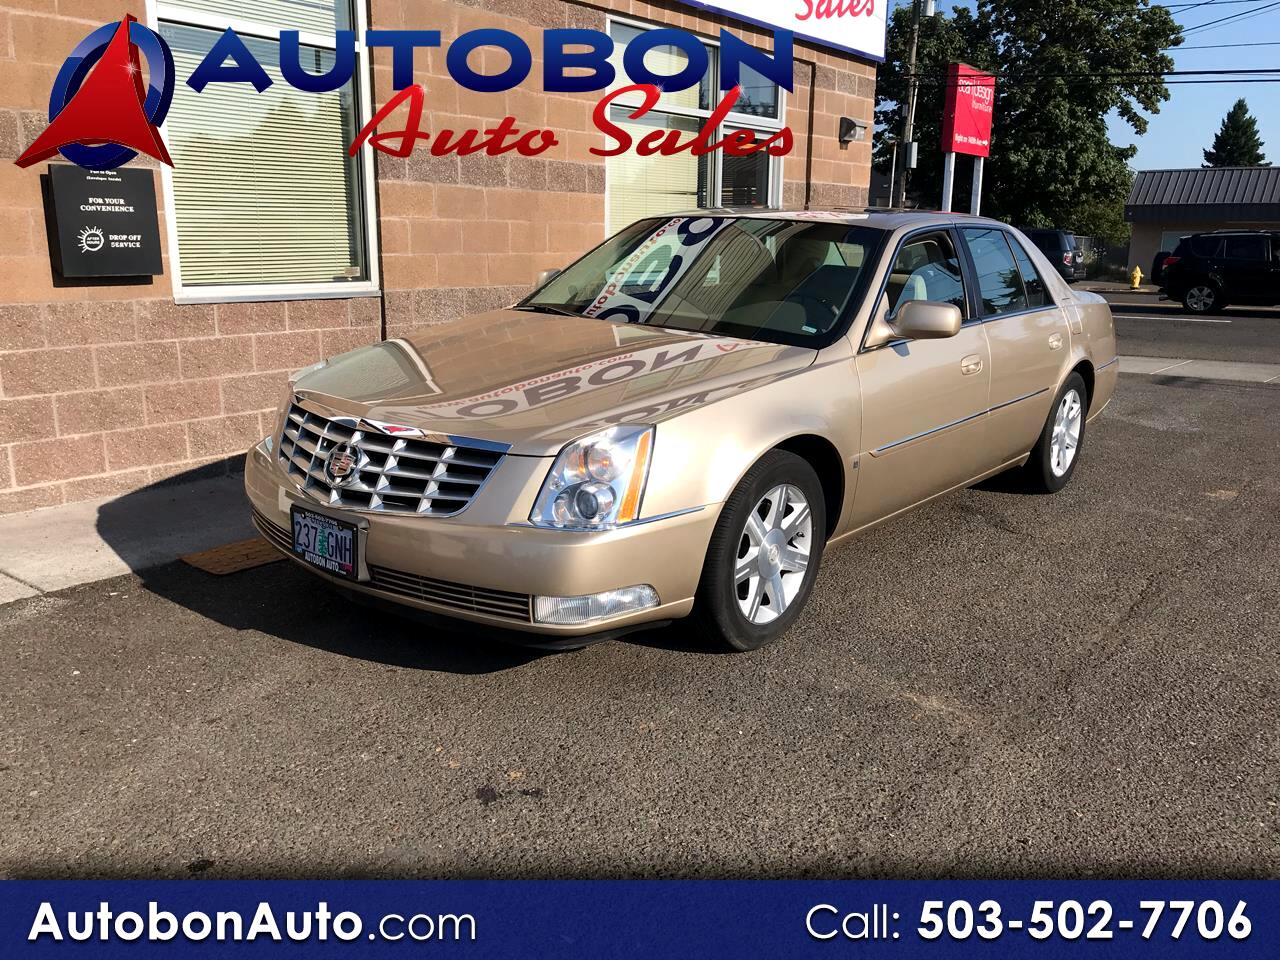 2006 Cadillac DTS 4dr Sdn w/1SB